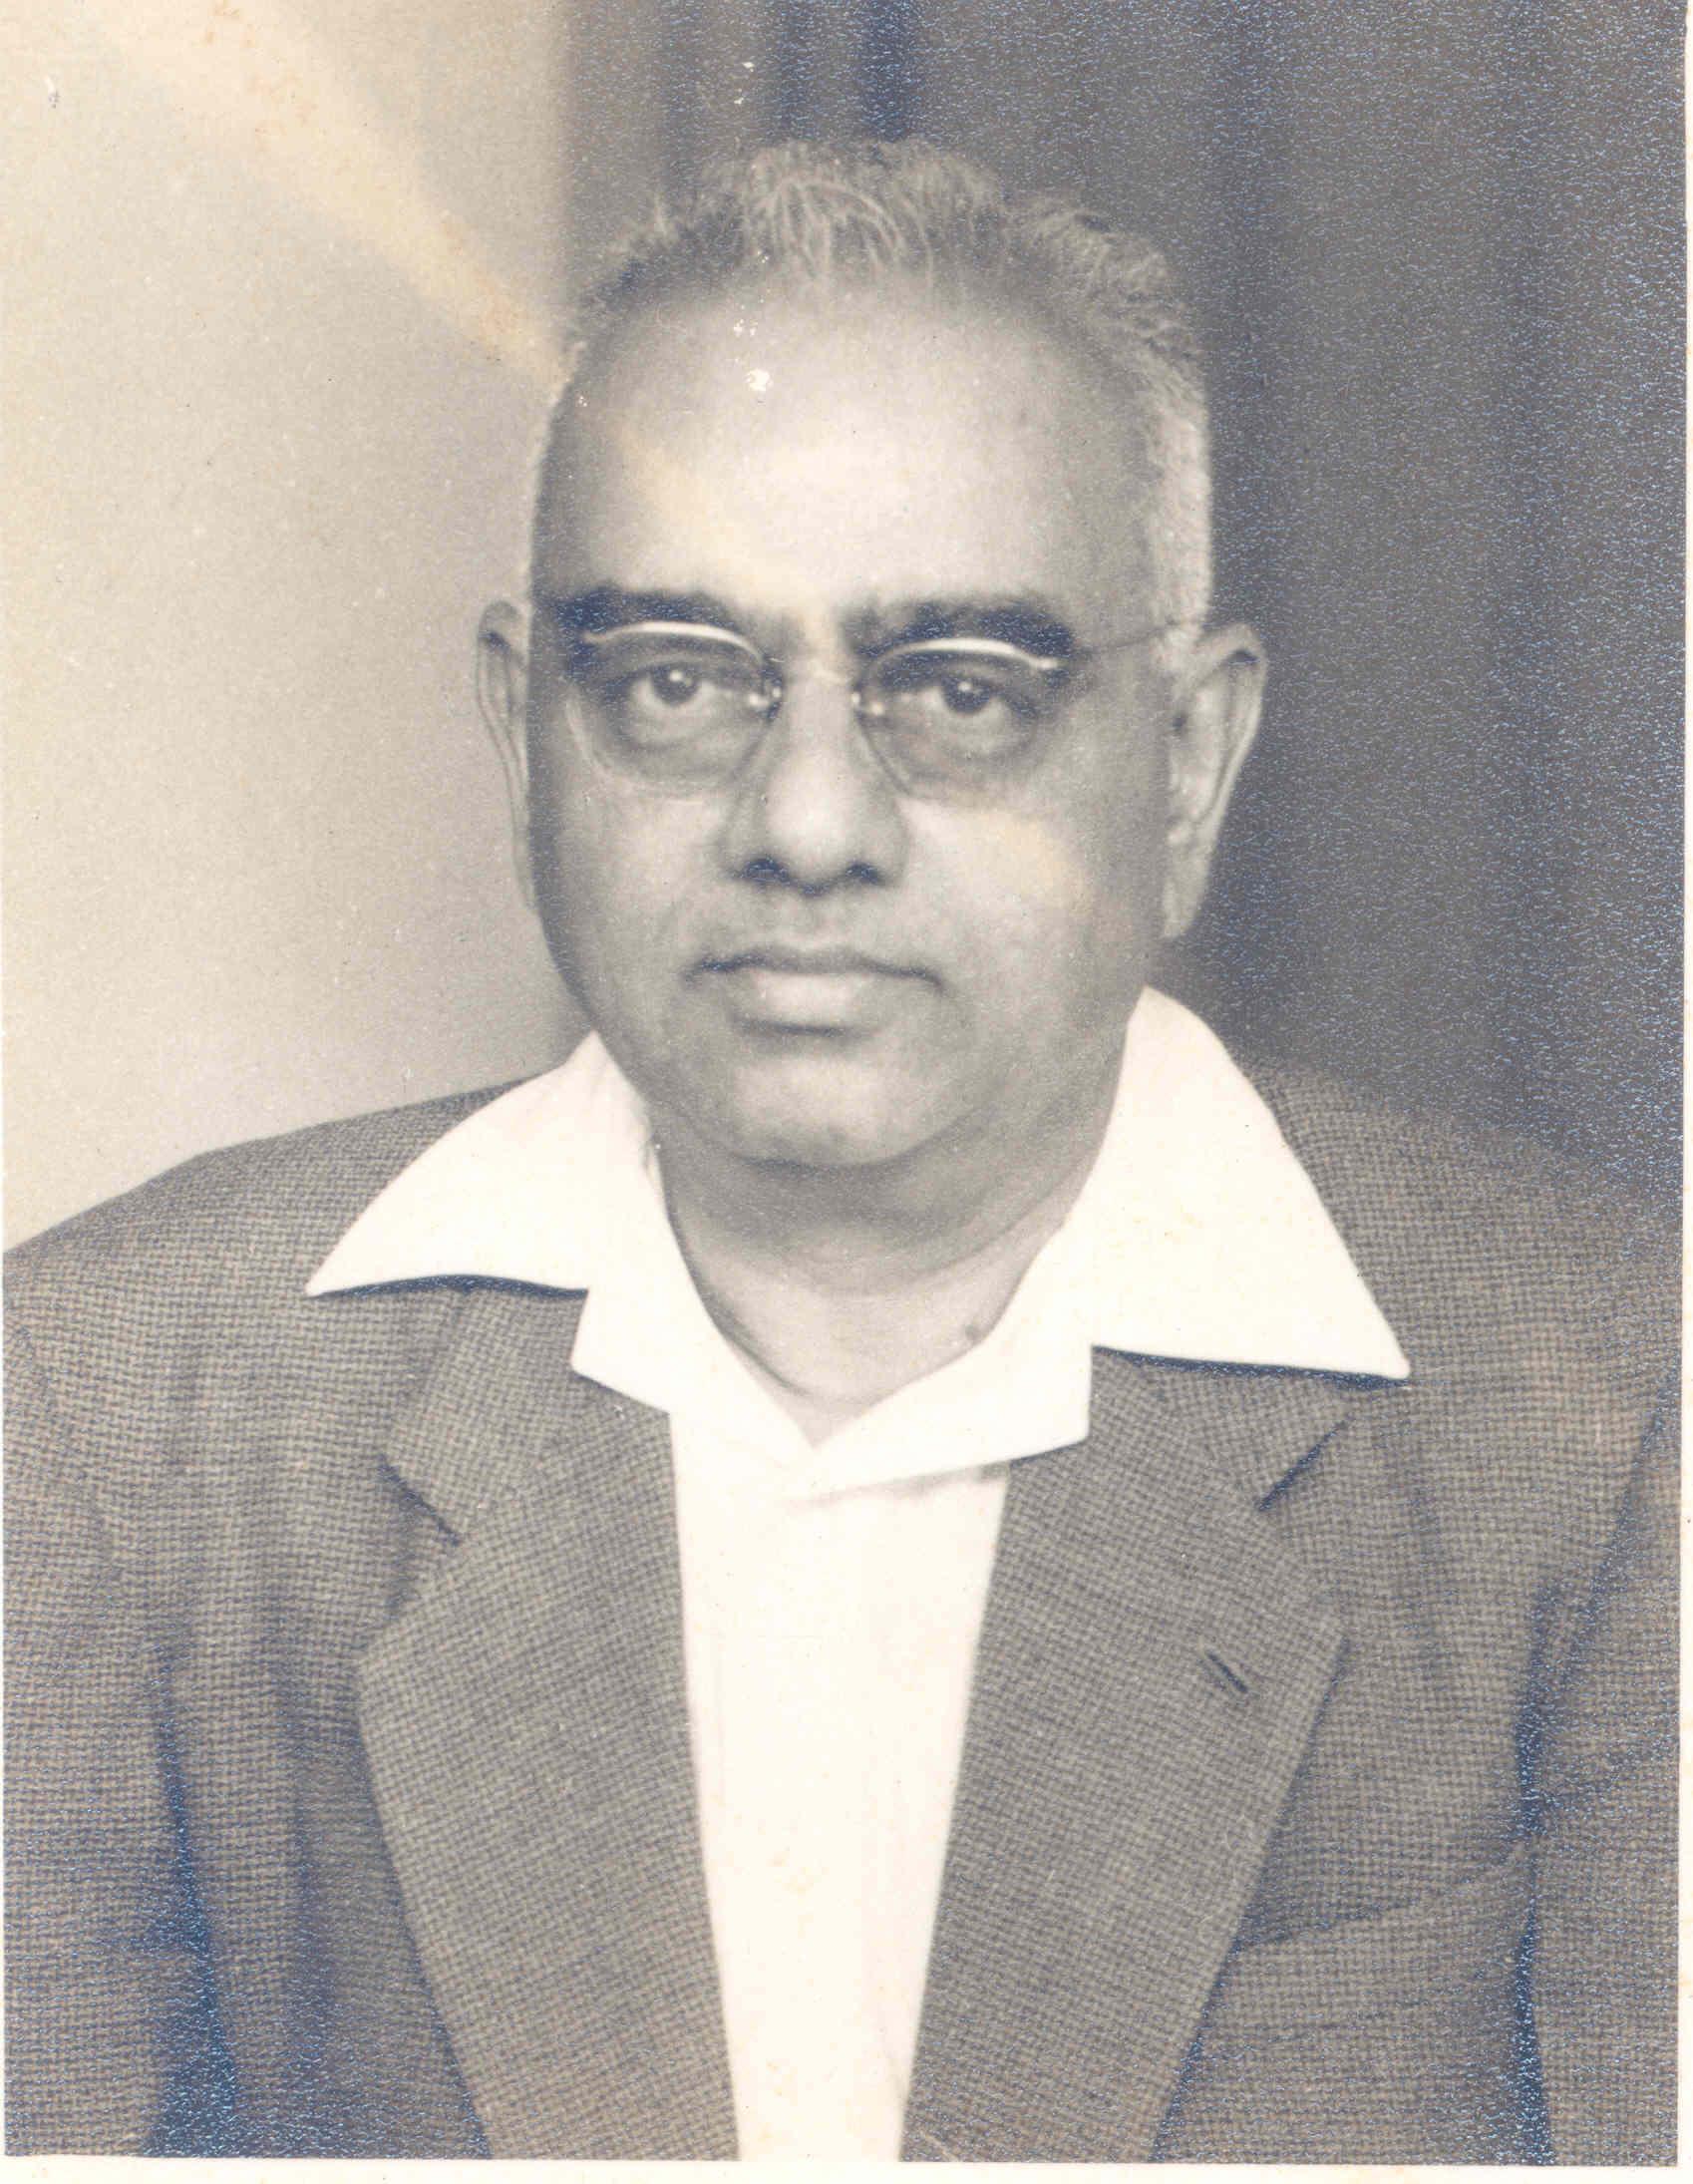 Profile image of Govindaswamy, M V